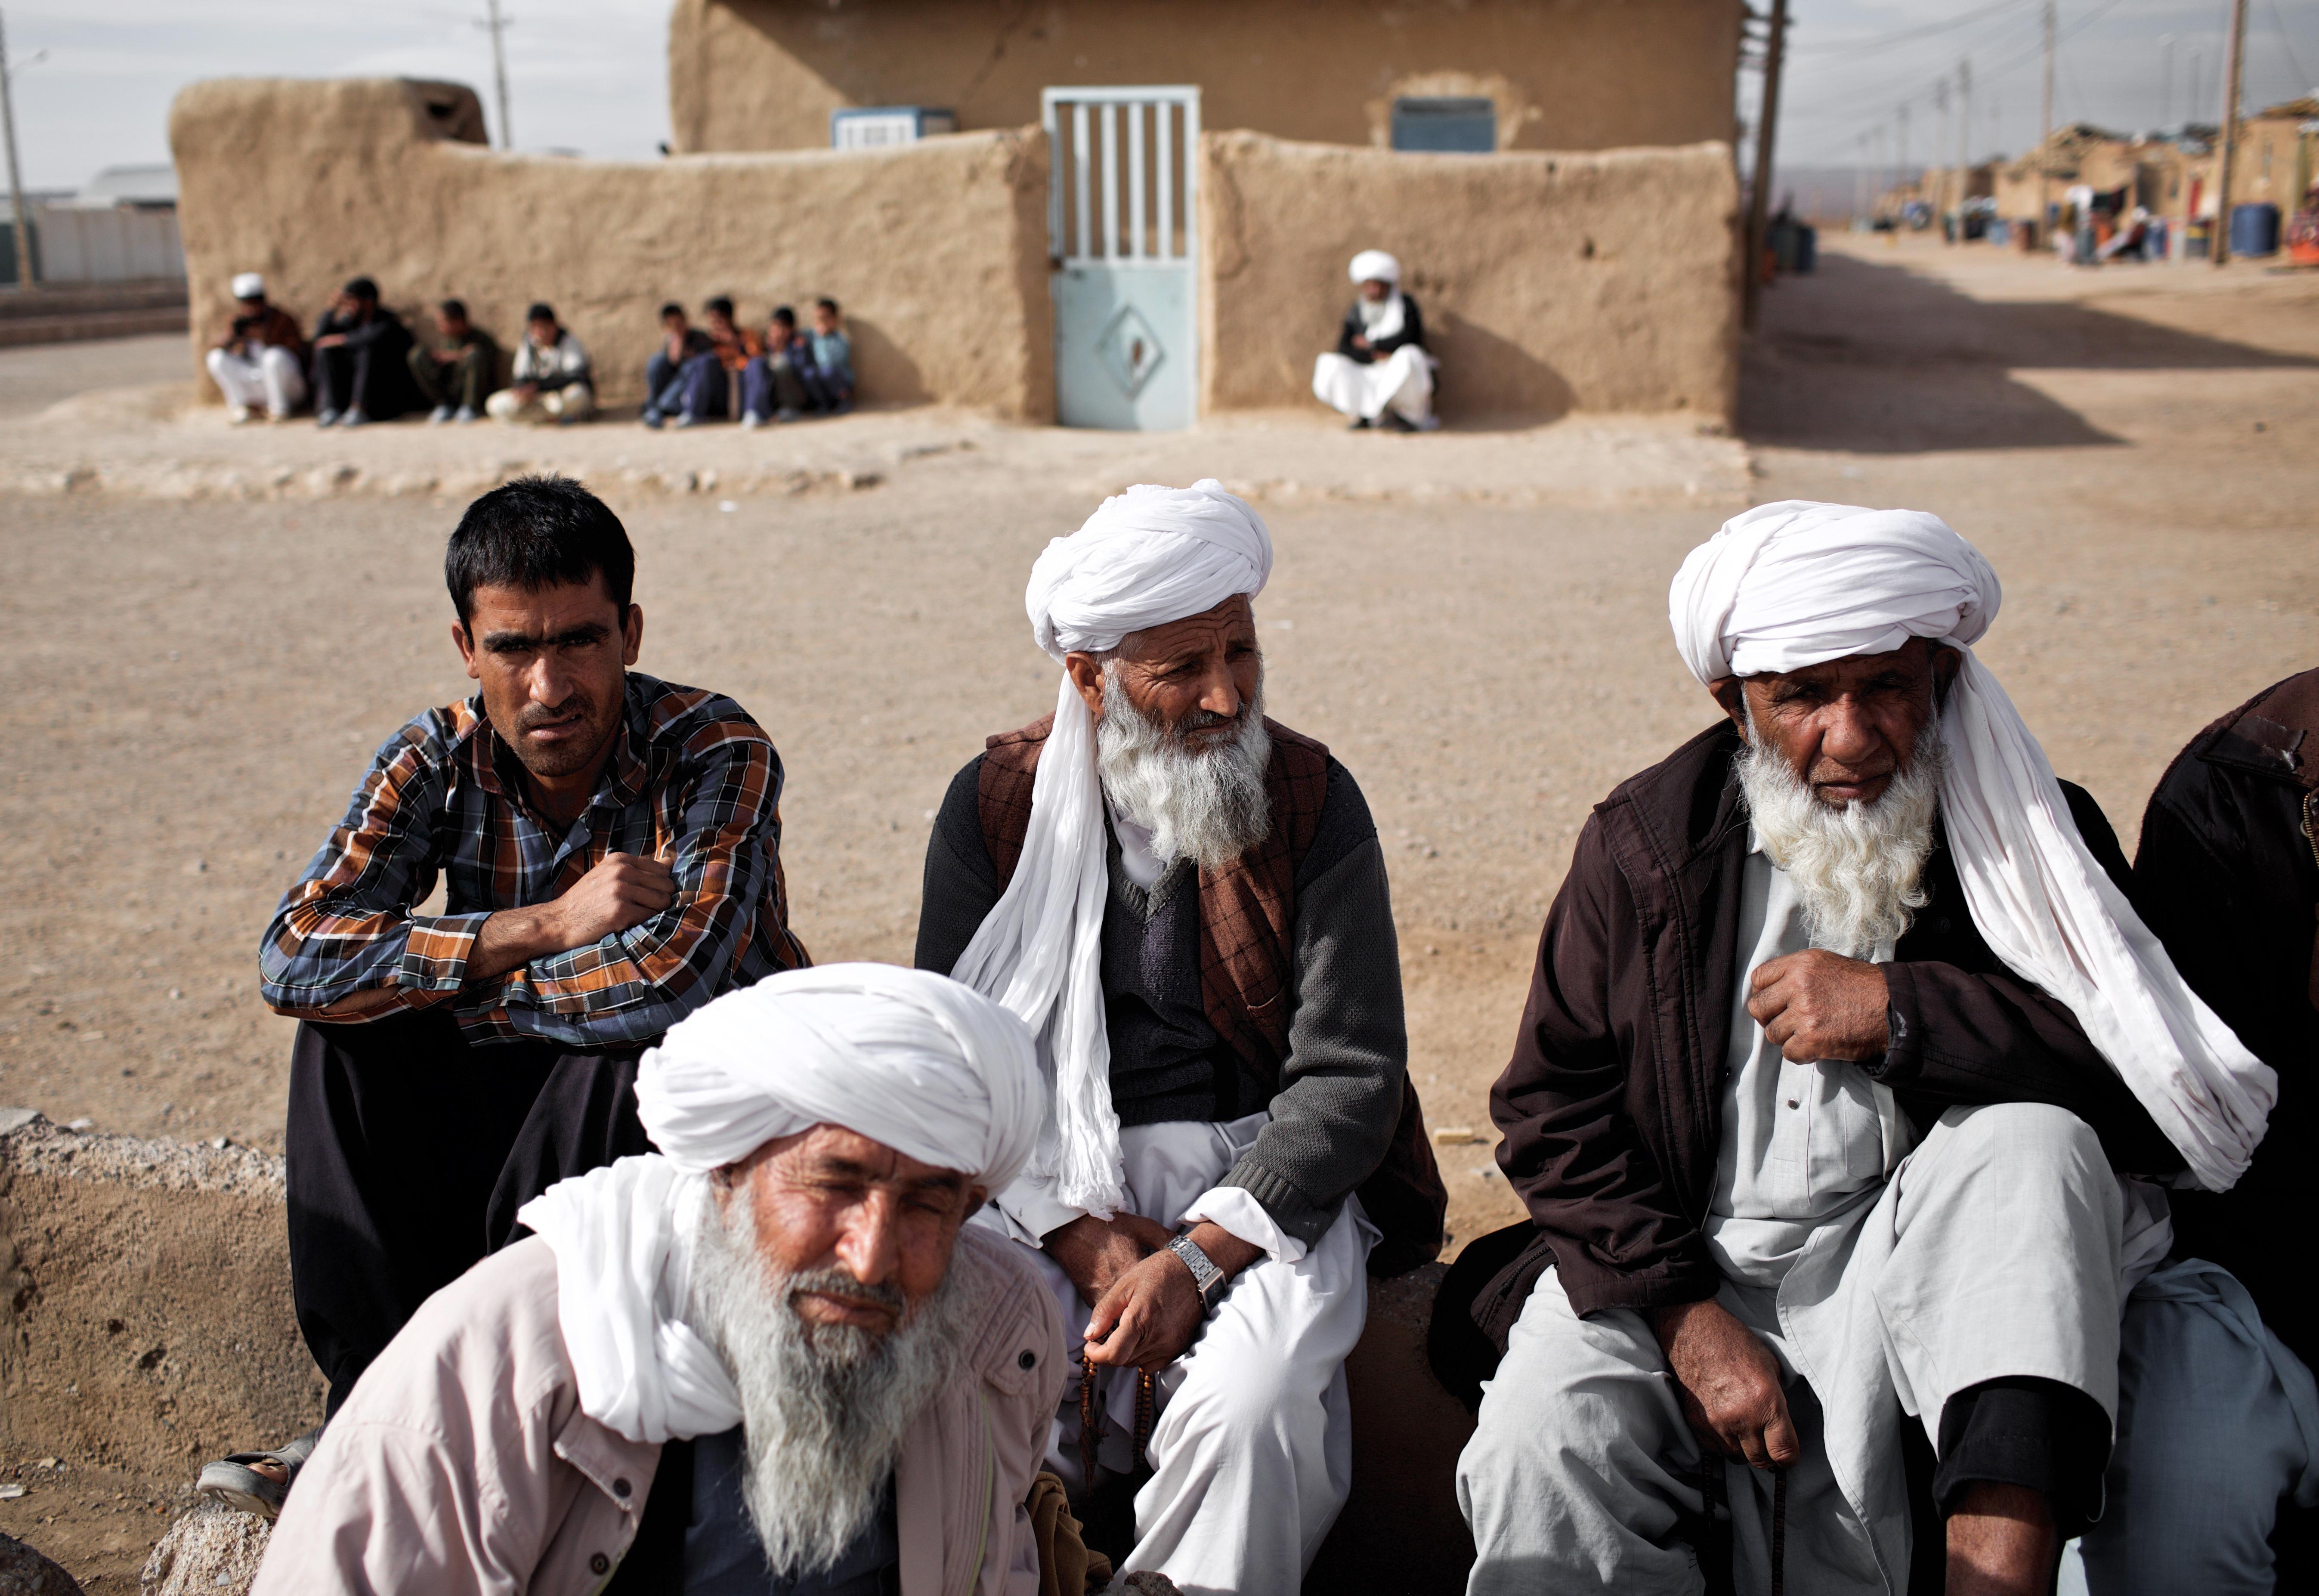 Afghan refugees sent to Syria war speak out against Iran